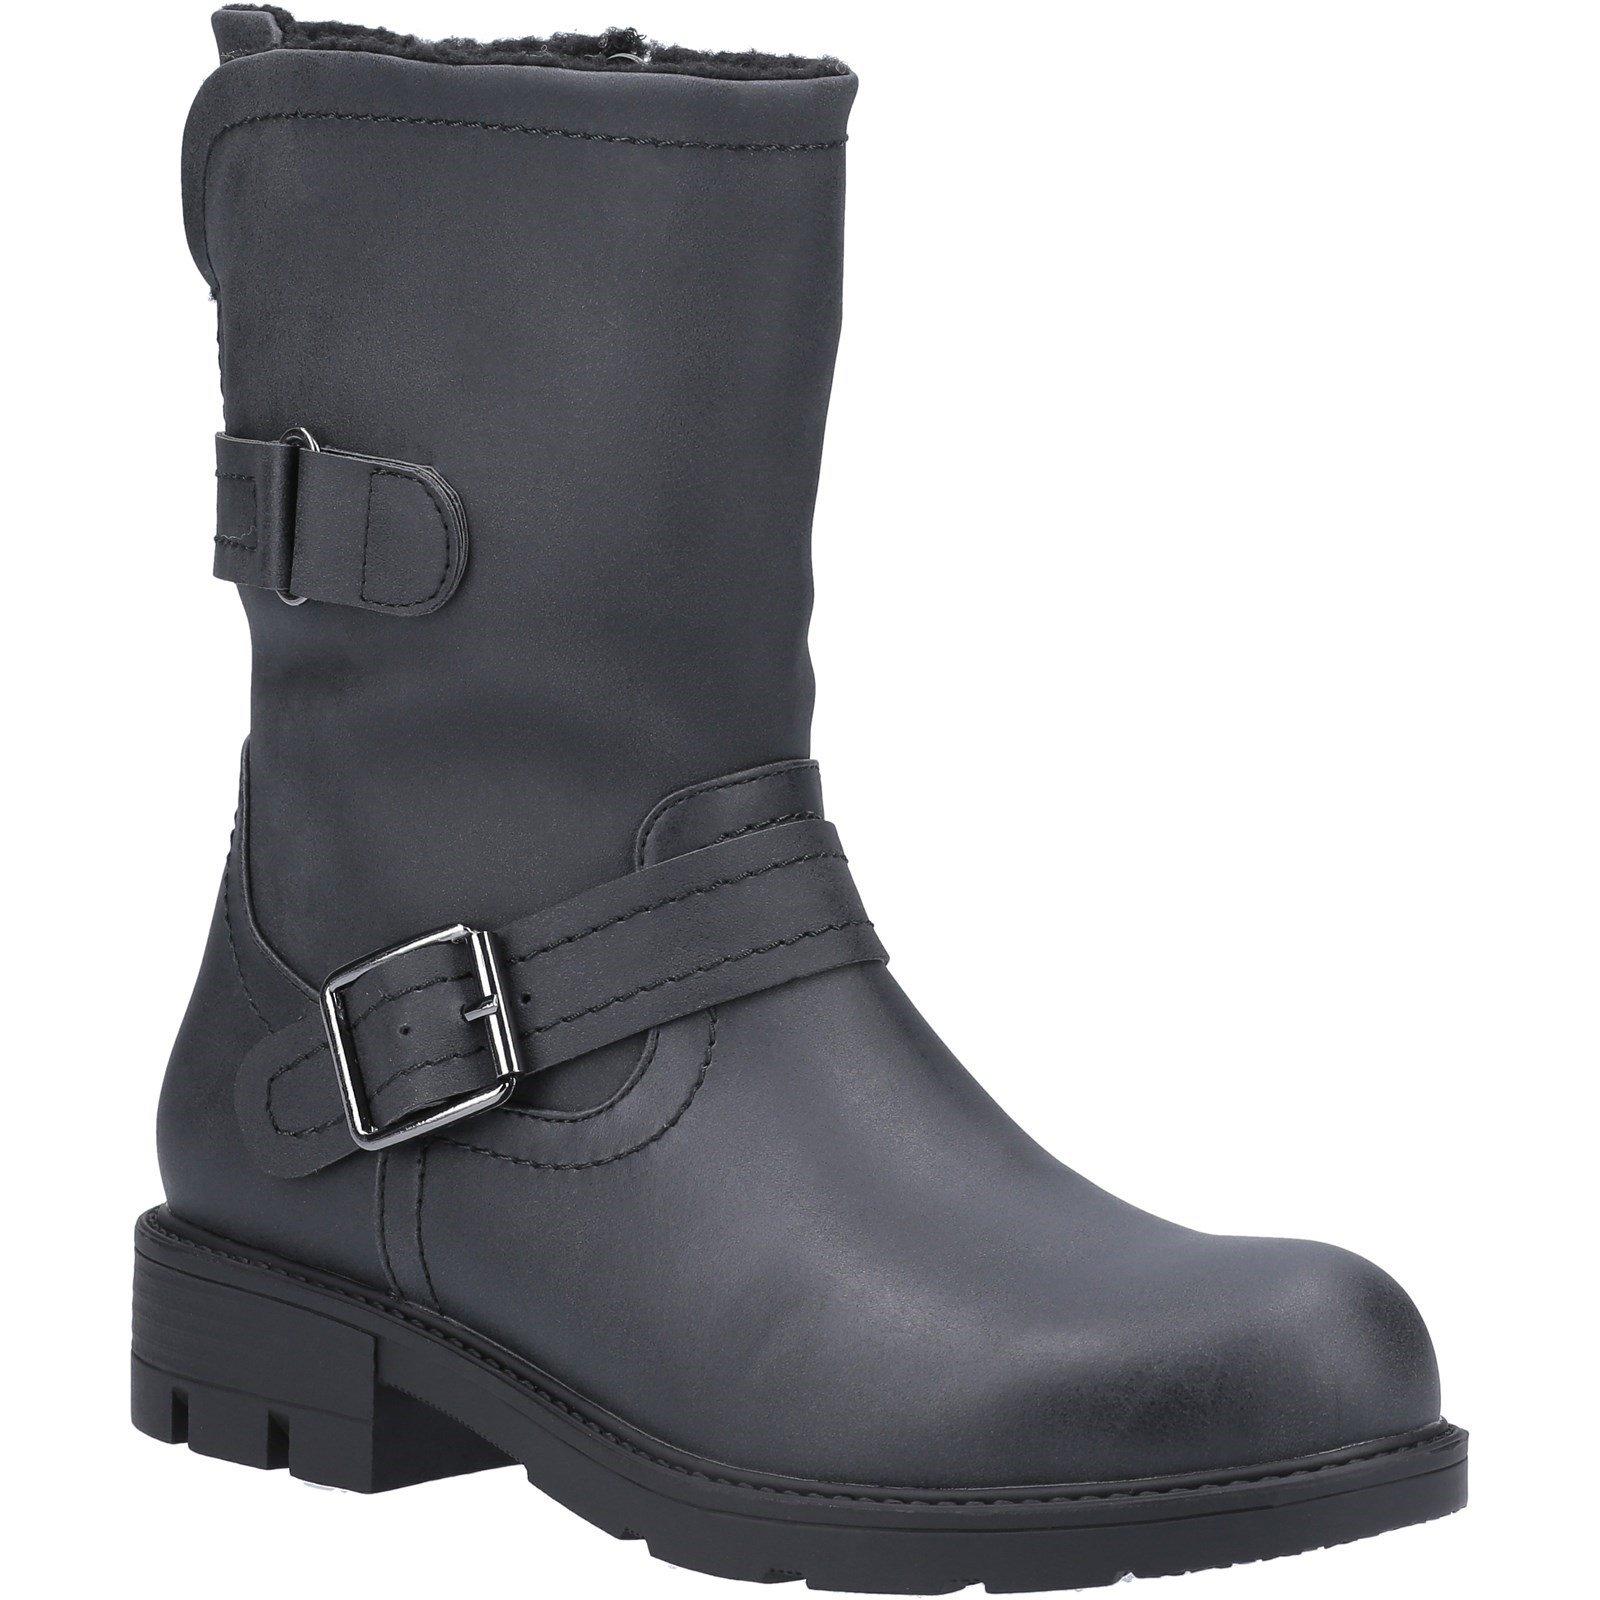 Divaz Women's Whitney Fur Lined Boot Various Colours 31086 - Black 3